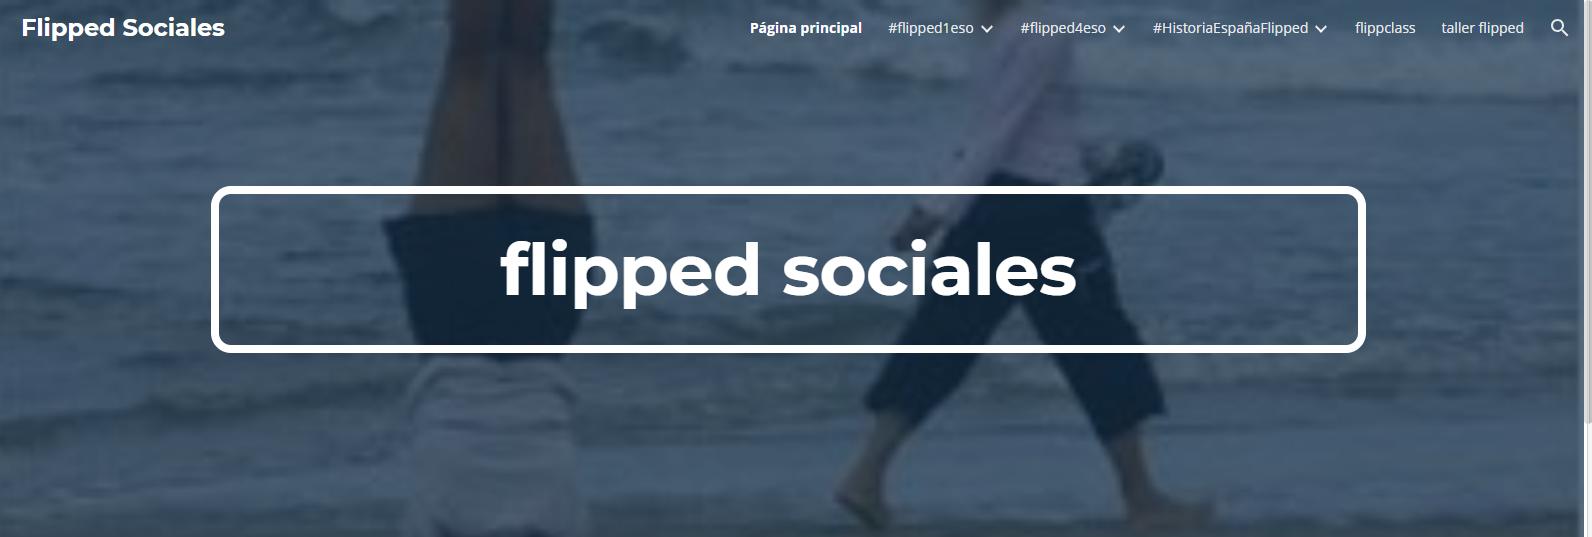 flipped_sociales